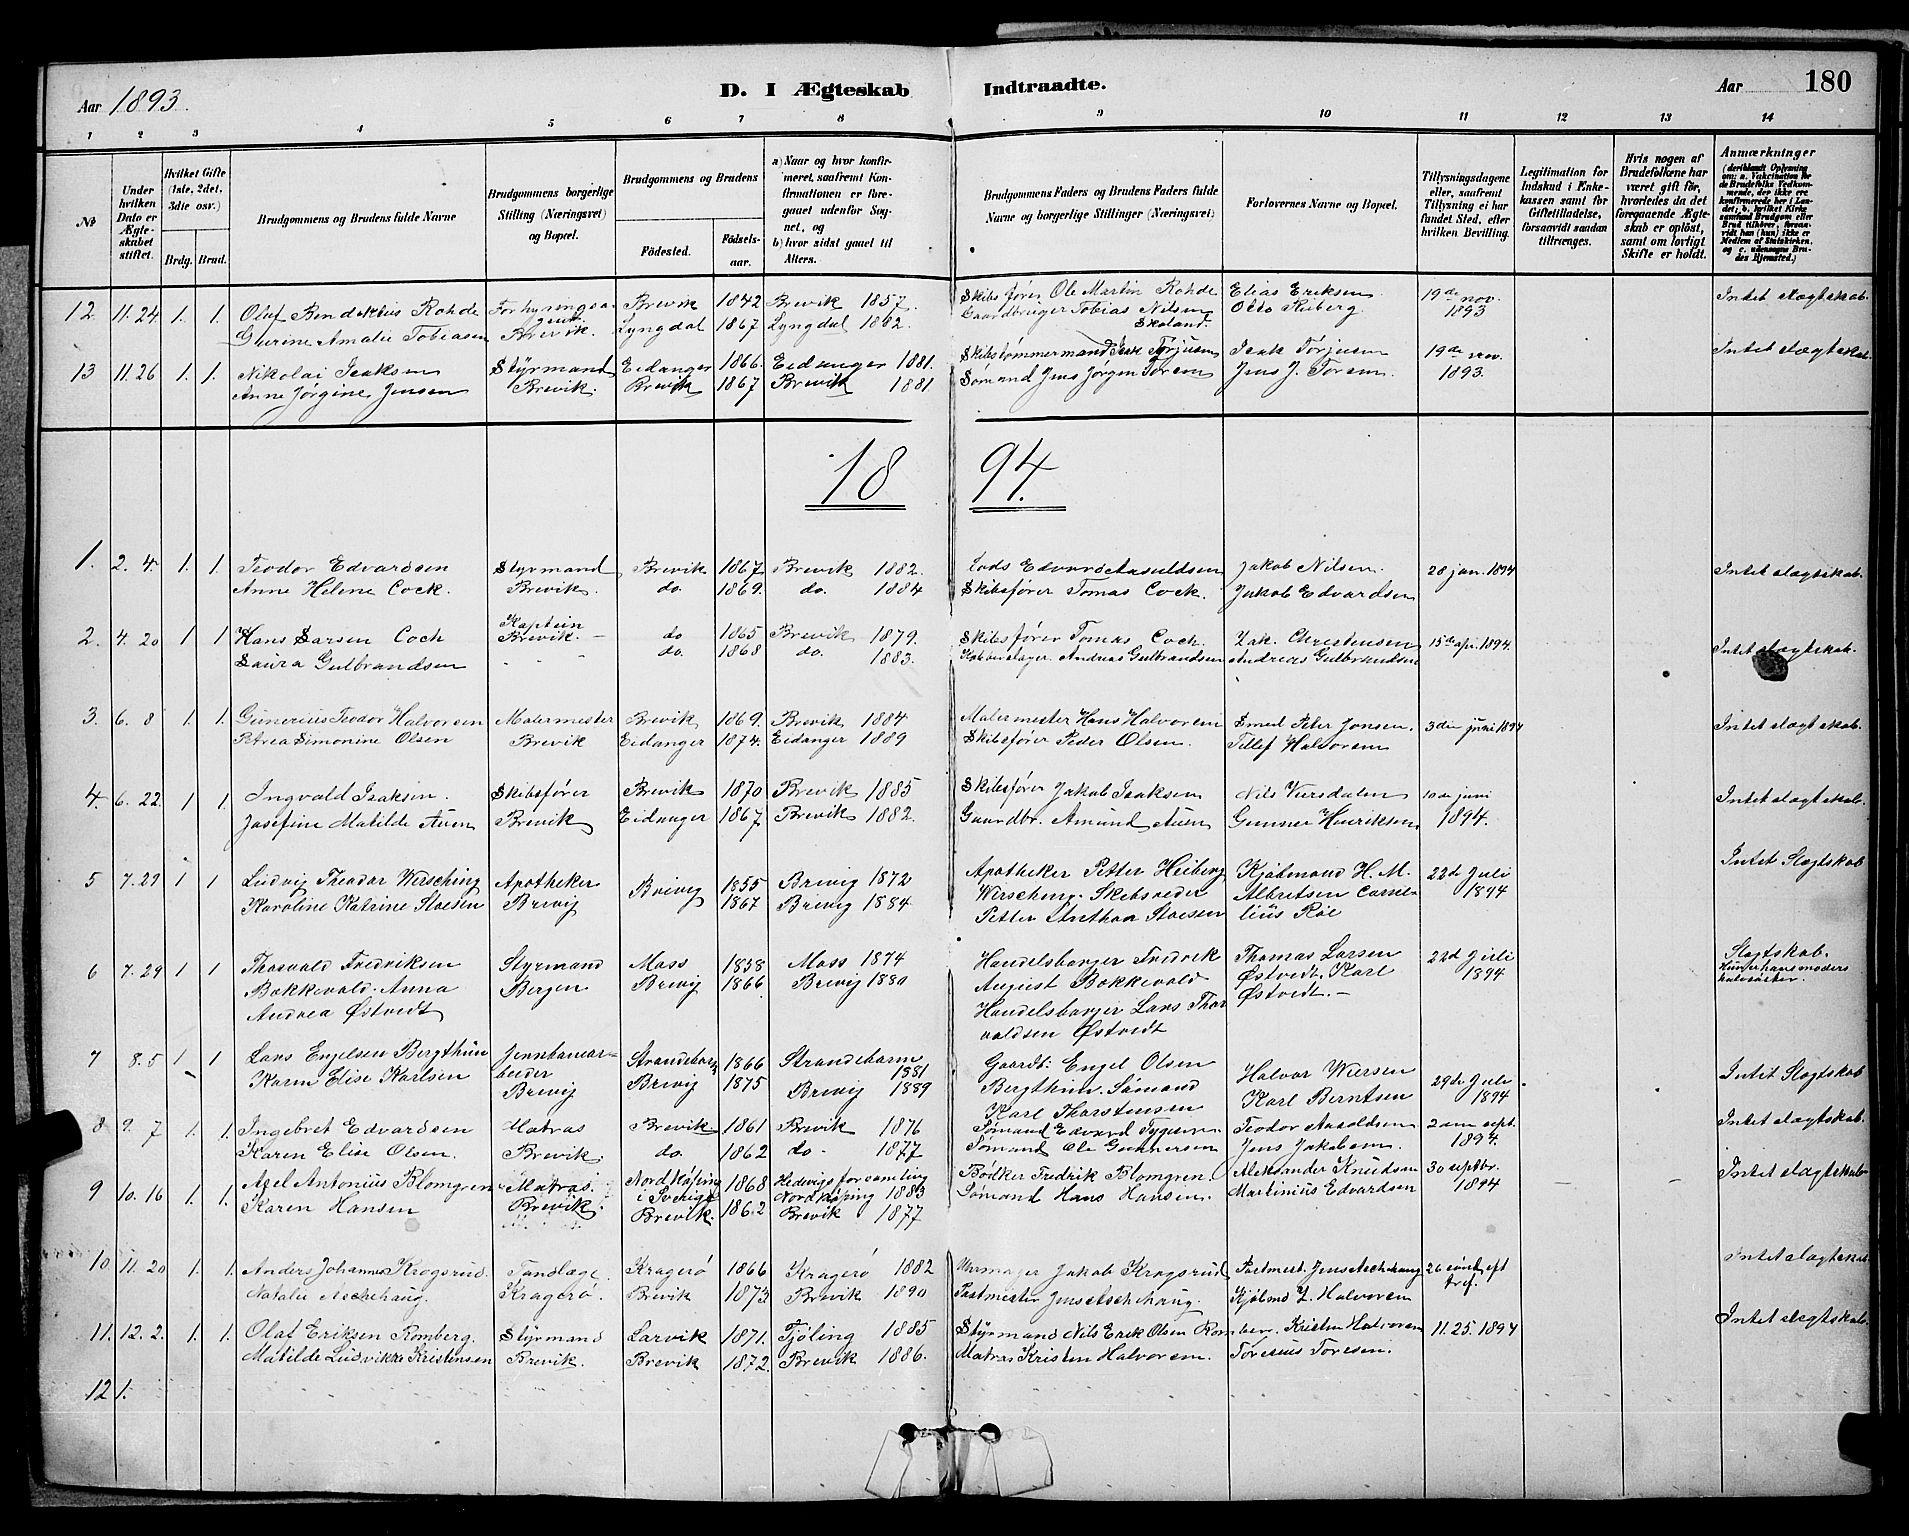 SAKO, Brevik kirkebøker, G/Ga/L0004: Klokkerbok nr. 4, 1882-1900, s. 180